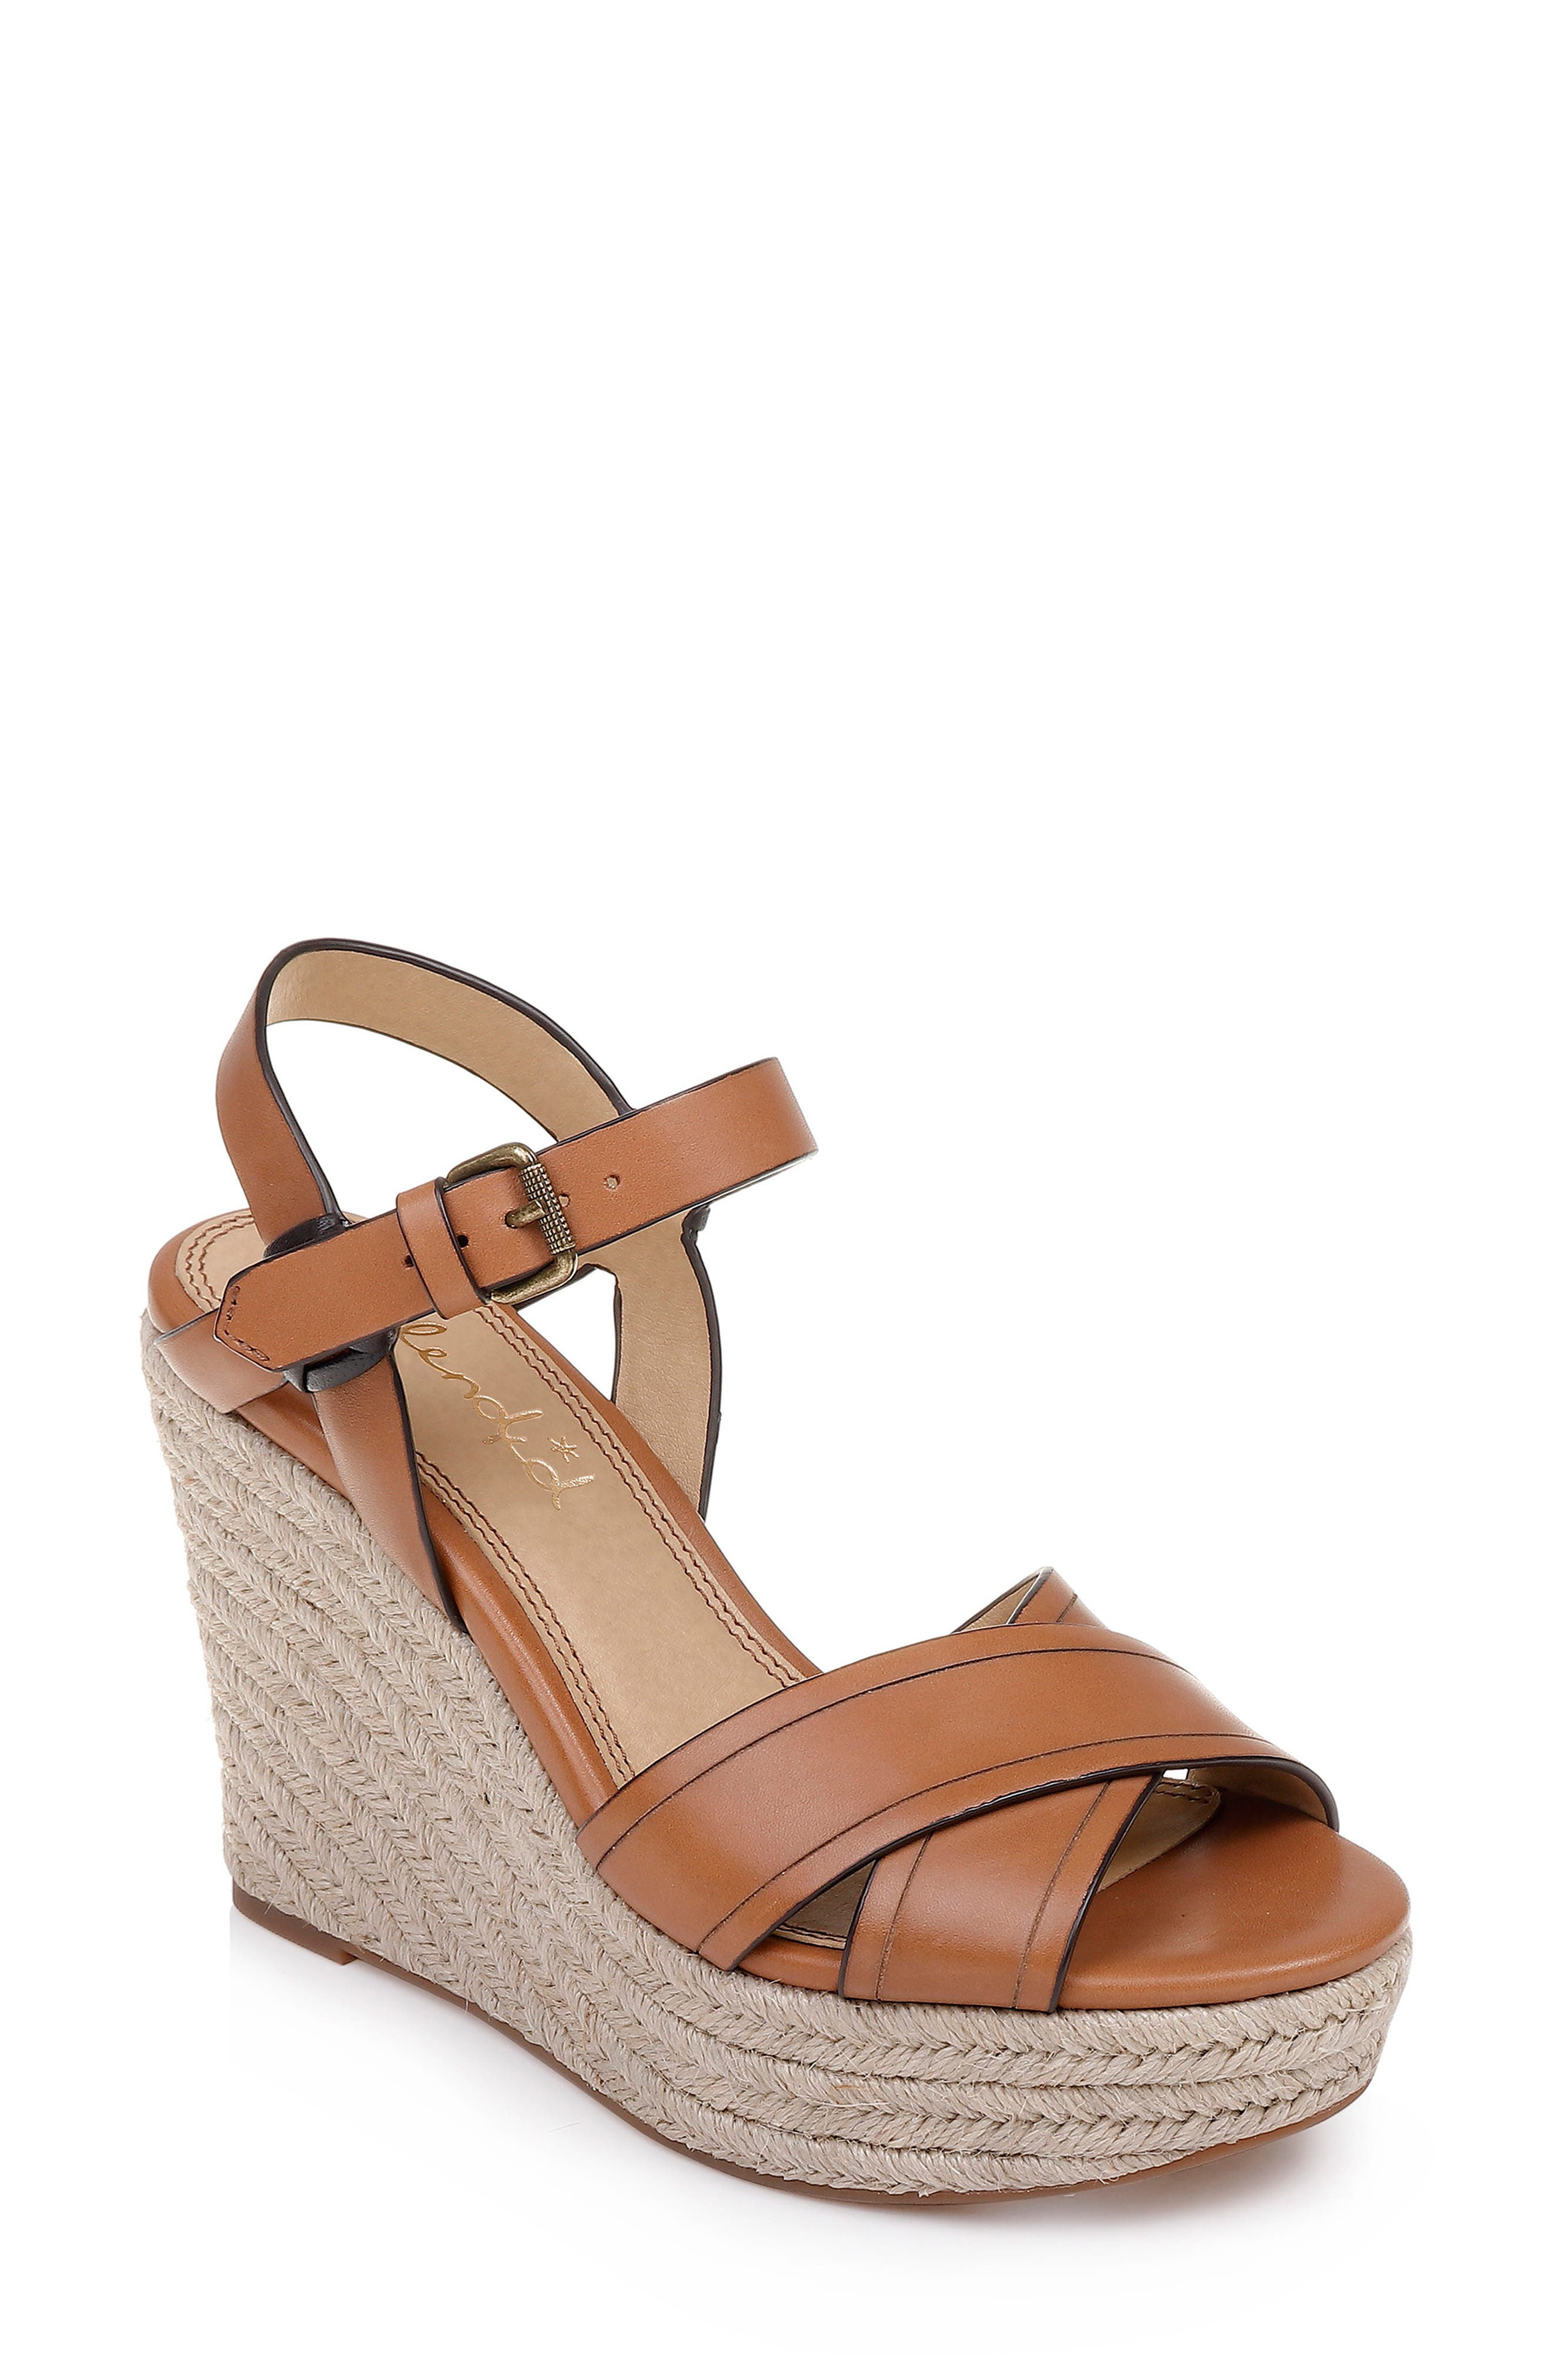 Splendid Taffeta Espadrille Wedge Sandal, Brown